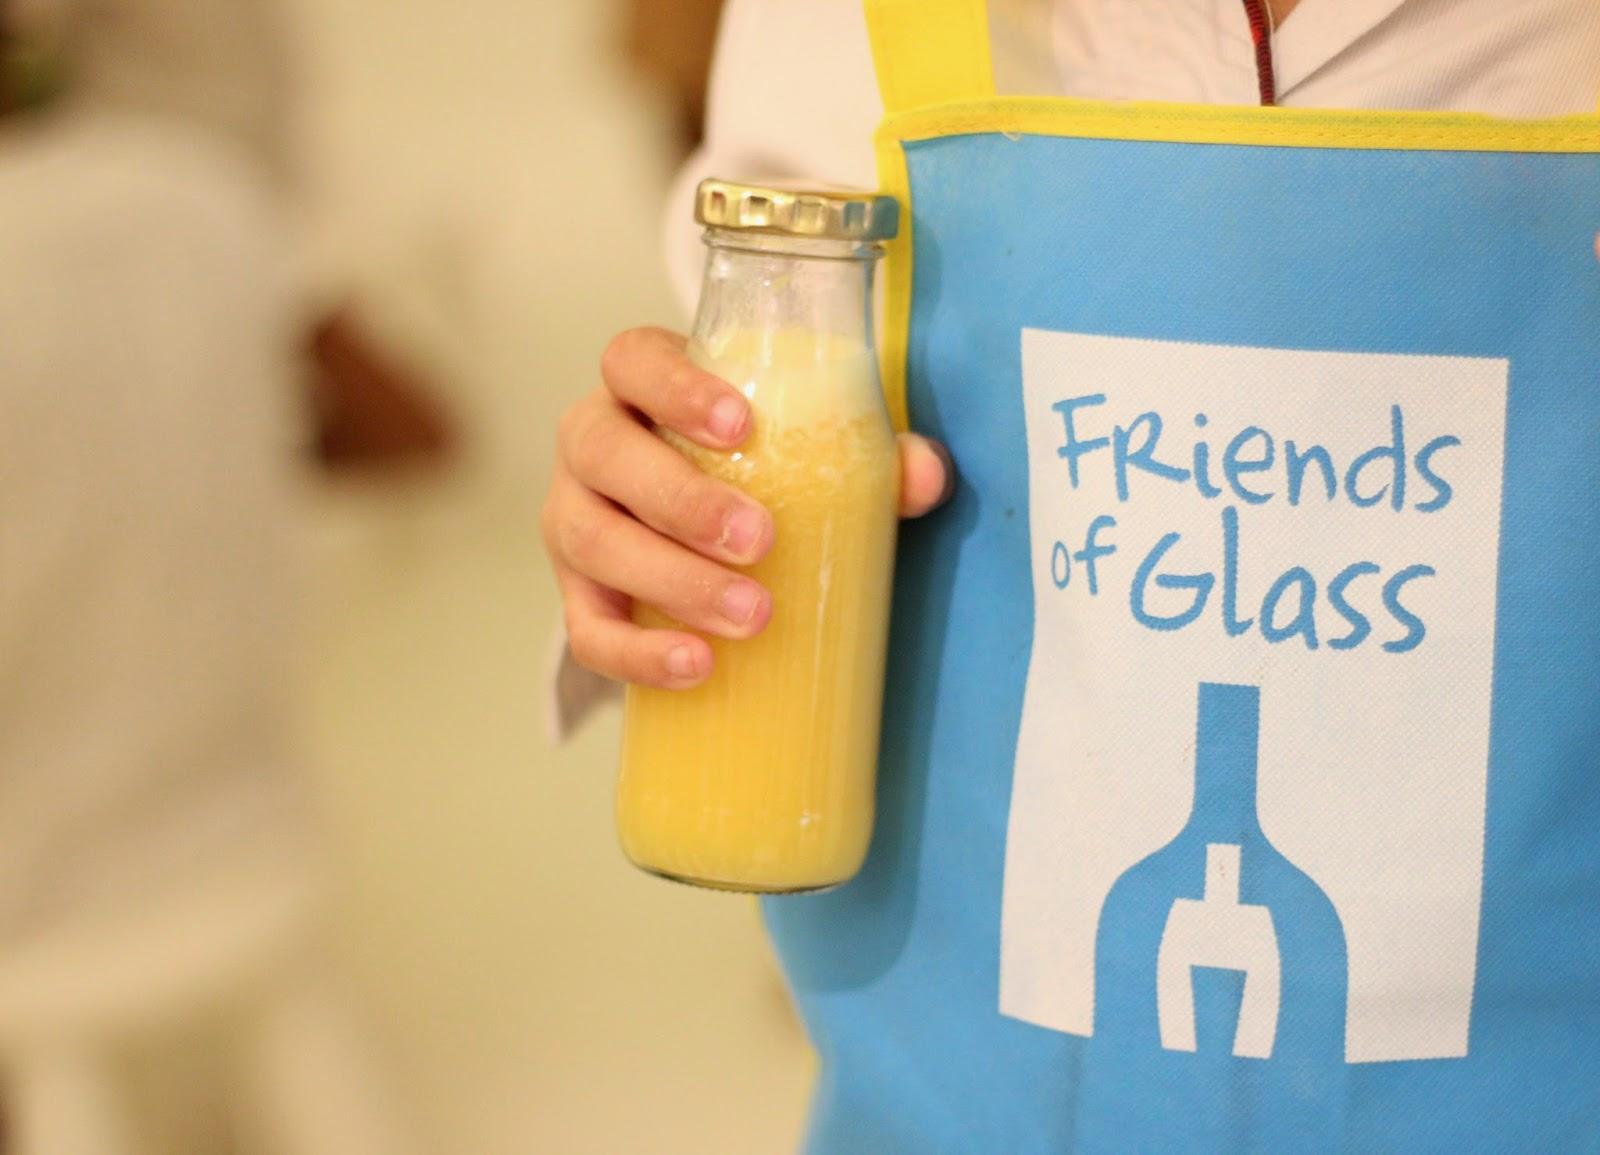 photo-friends_of_glass-España-conservar_en_vidrio-zumo